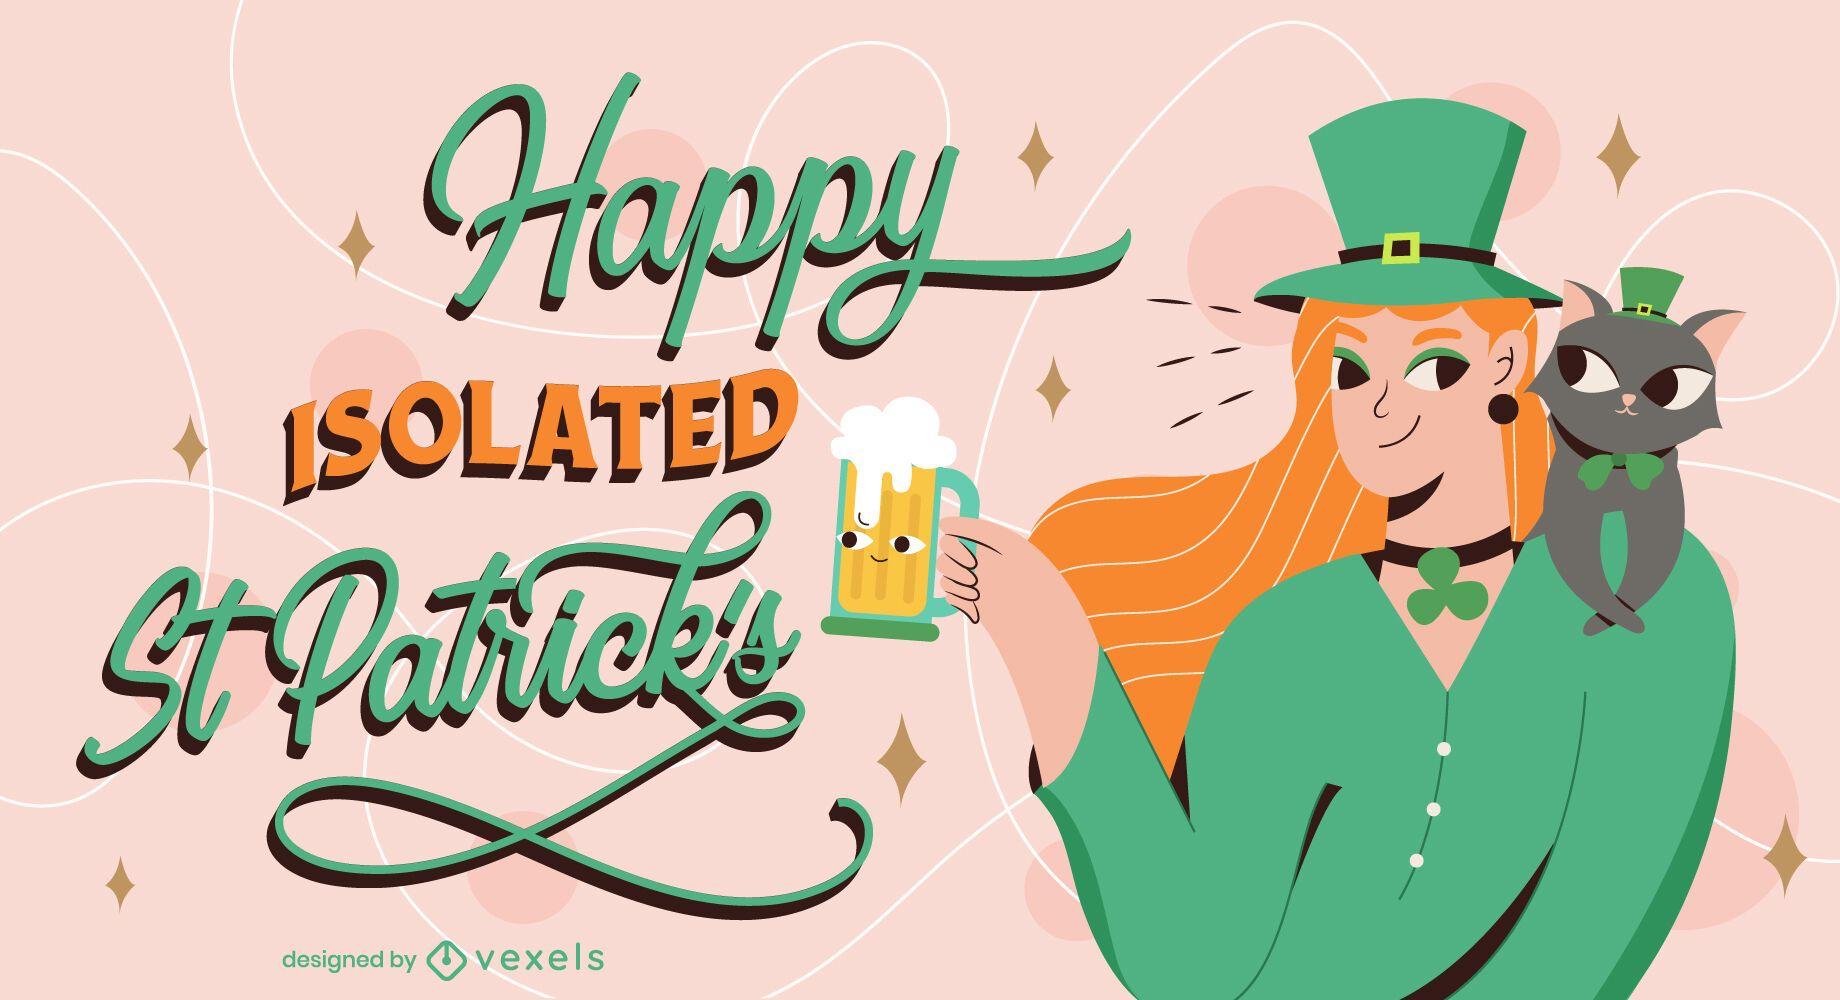 Happy isolated st patricks illustration